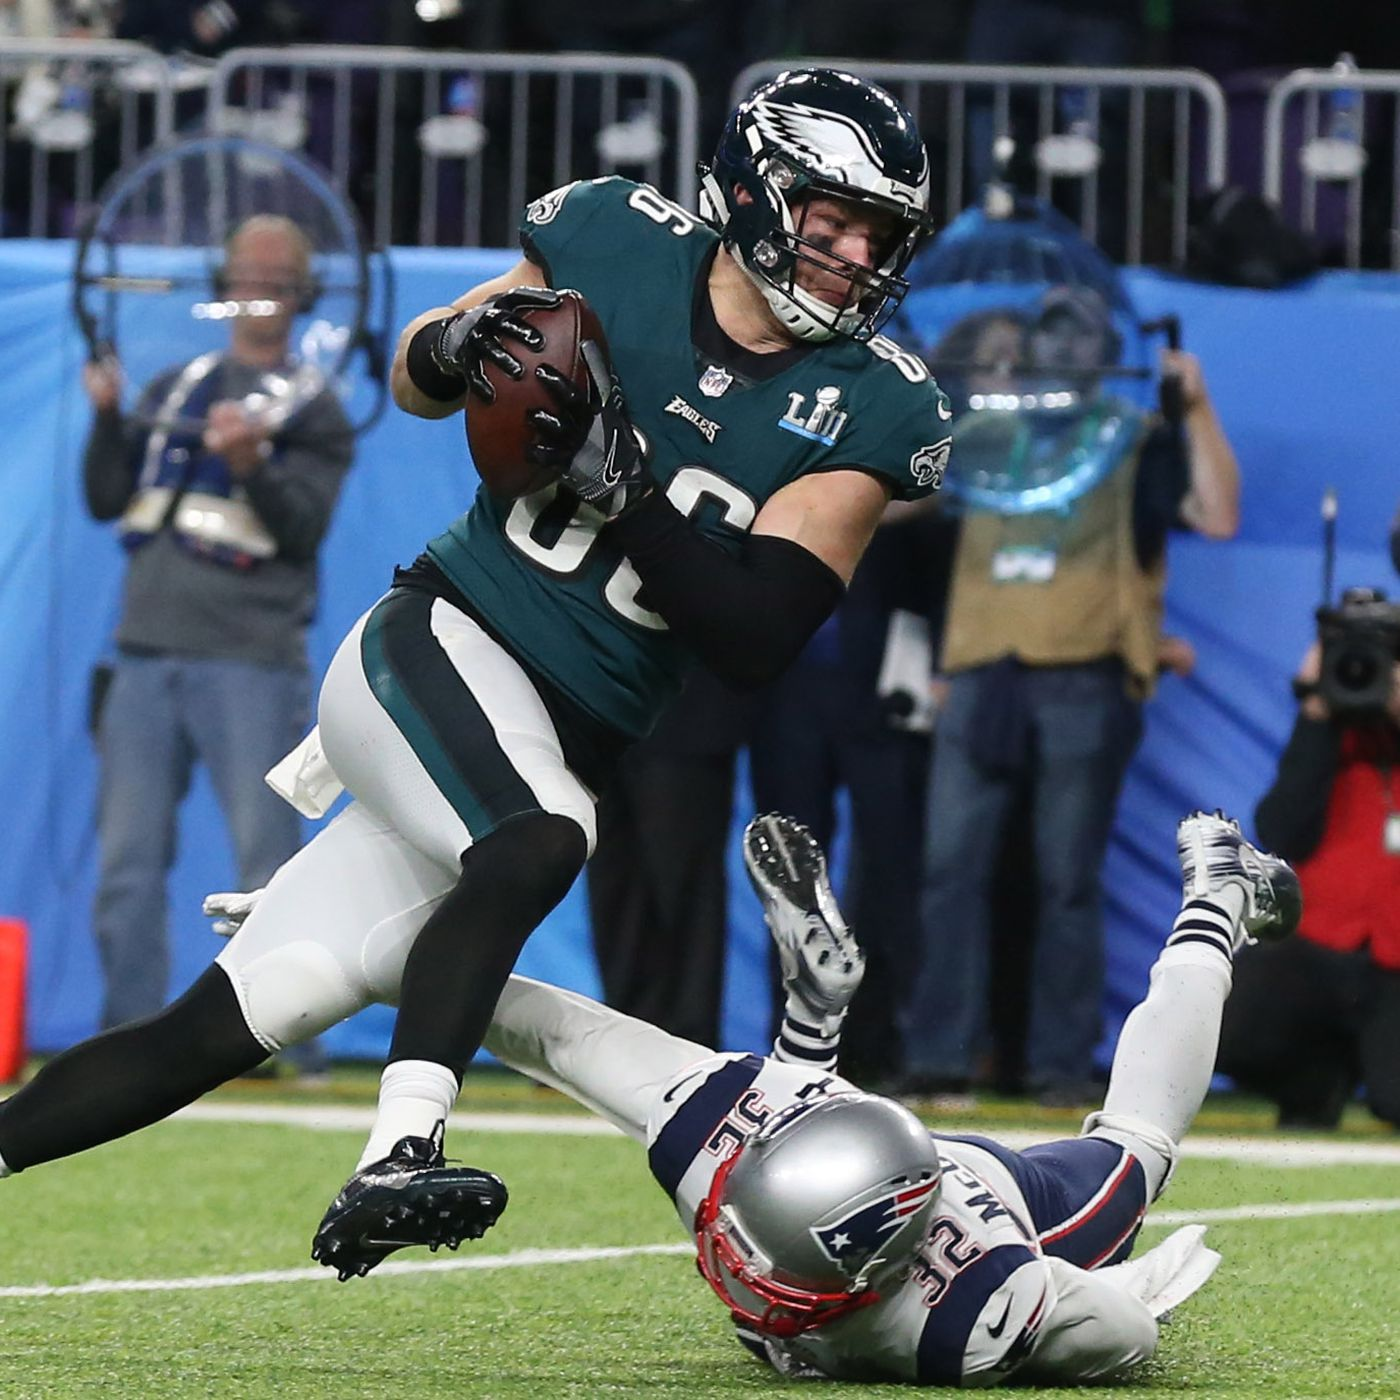 b3035a97e33 Eagles 2018 odds  Philadelphia small home favorite in season opener  Thursday - SBNation.com